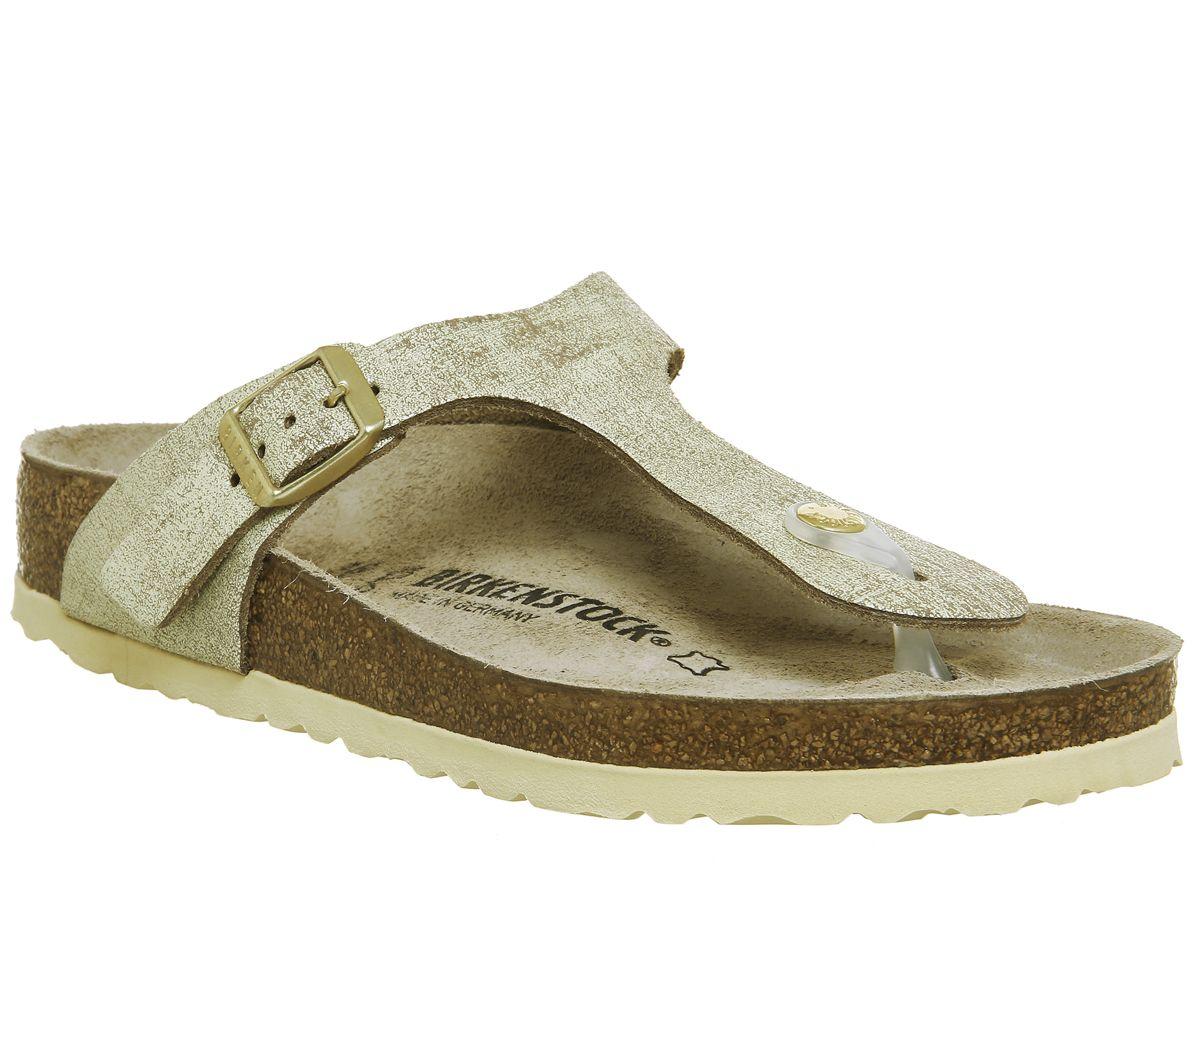 73ddd2fa5d0 Birkenstock Gizeh Toe Thong Sandals Washed Metallic Cream Gold - Sandals